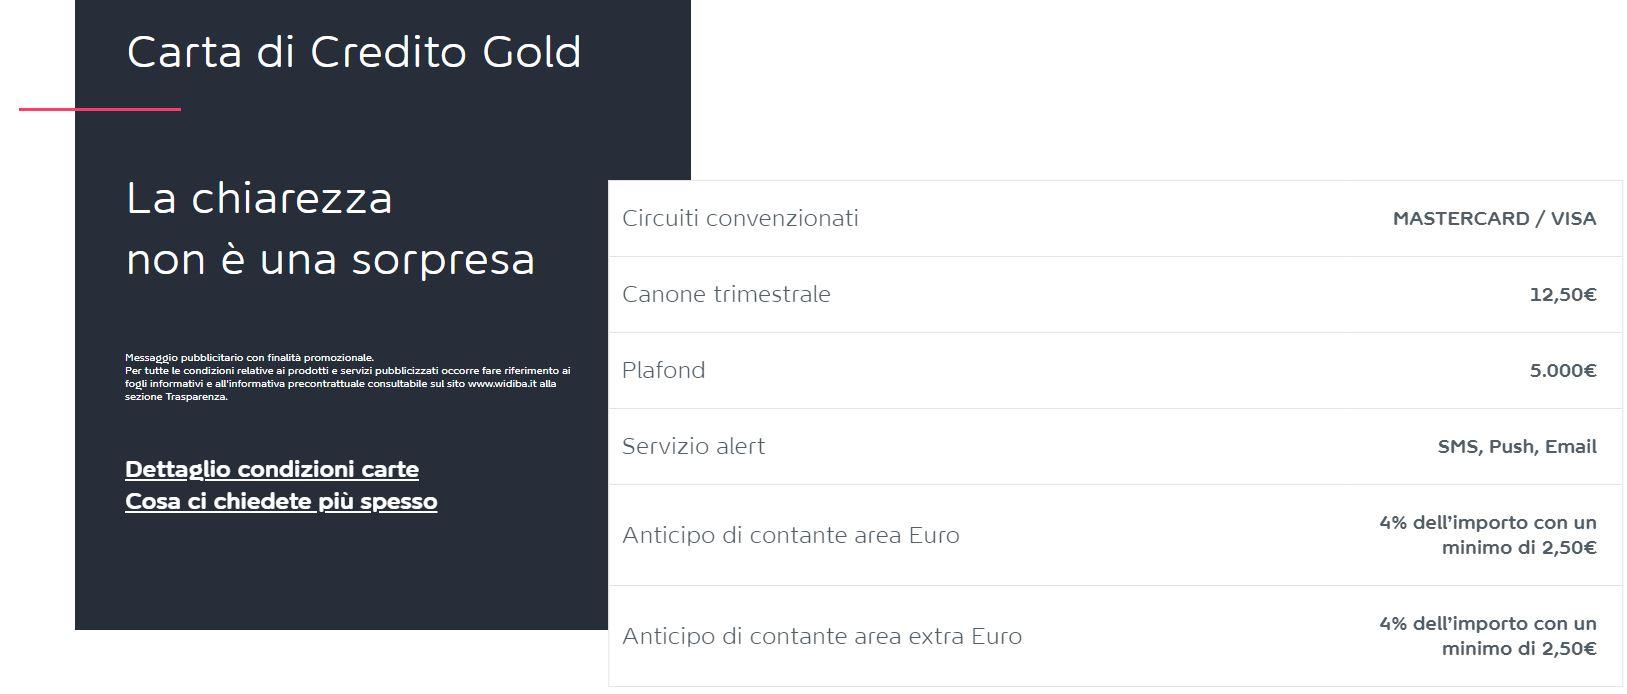 carta di credito gold widiba mastercard